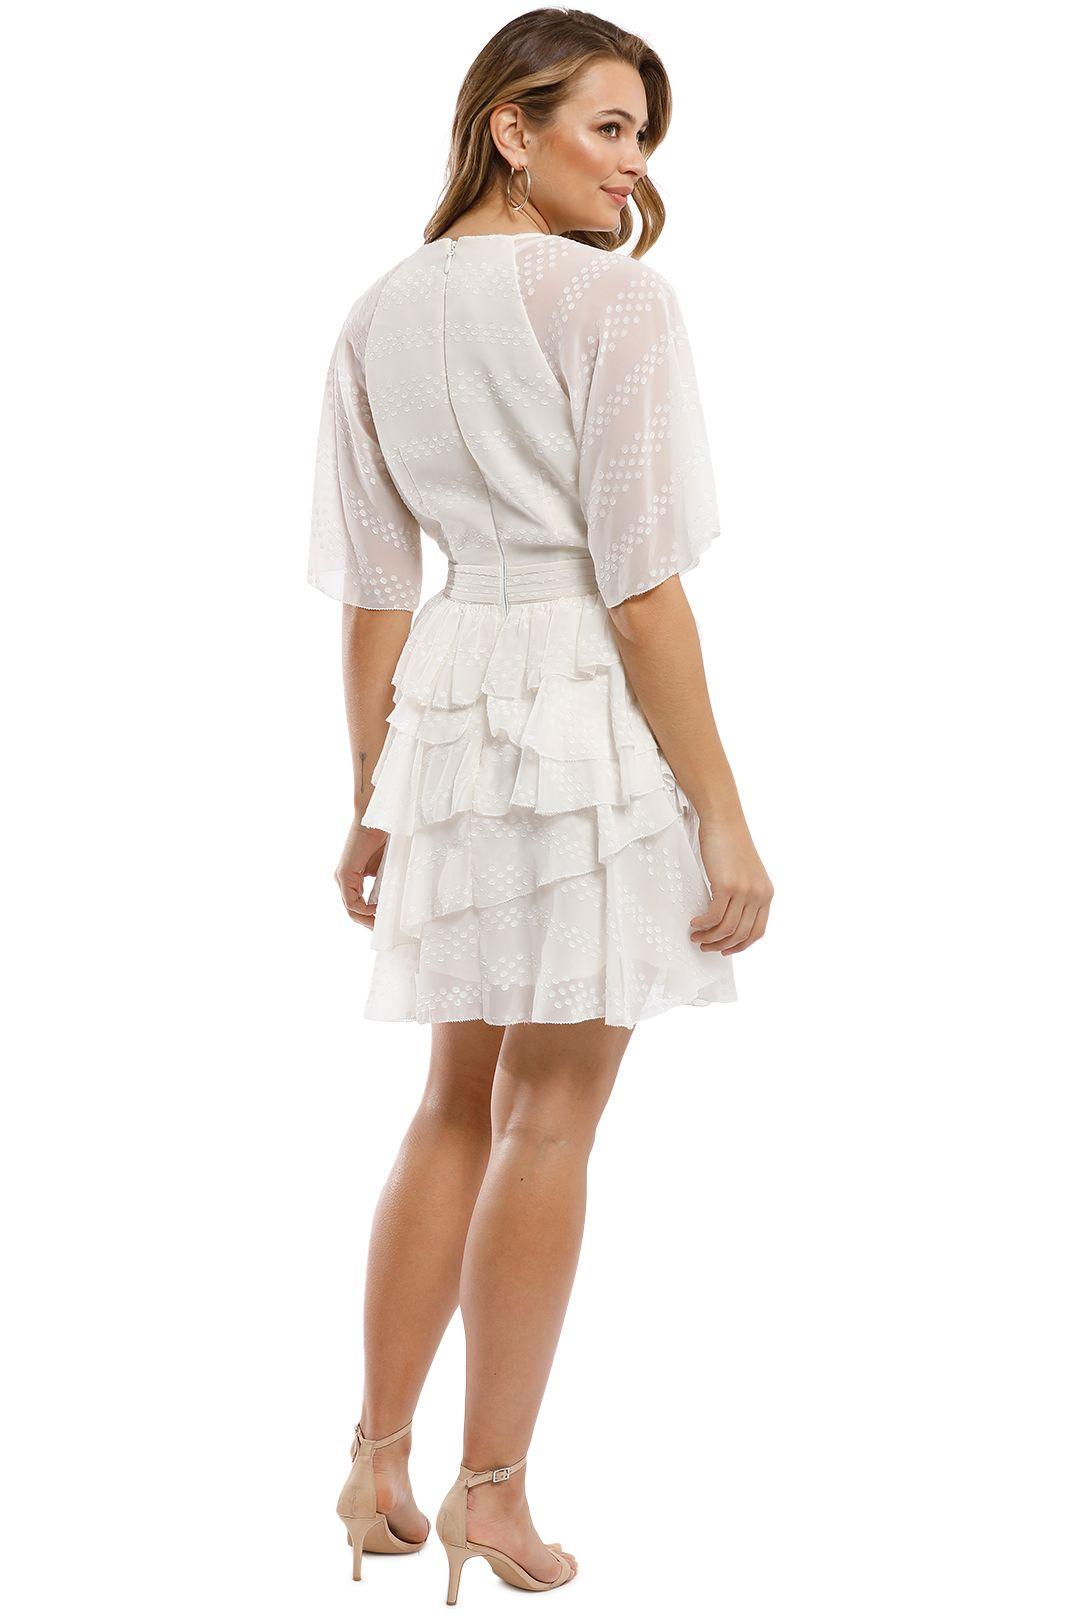 The Jetset Diaries - Twiggy Mini Dress - Ivory - Back